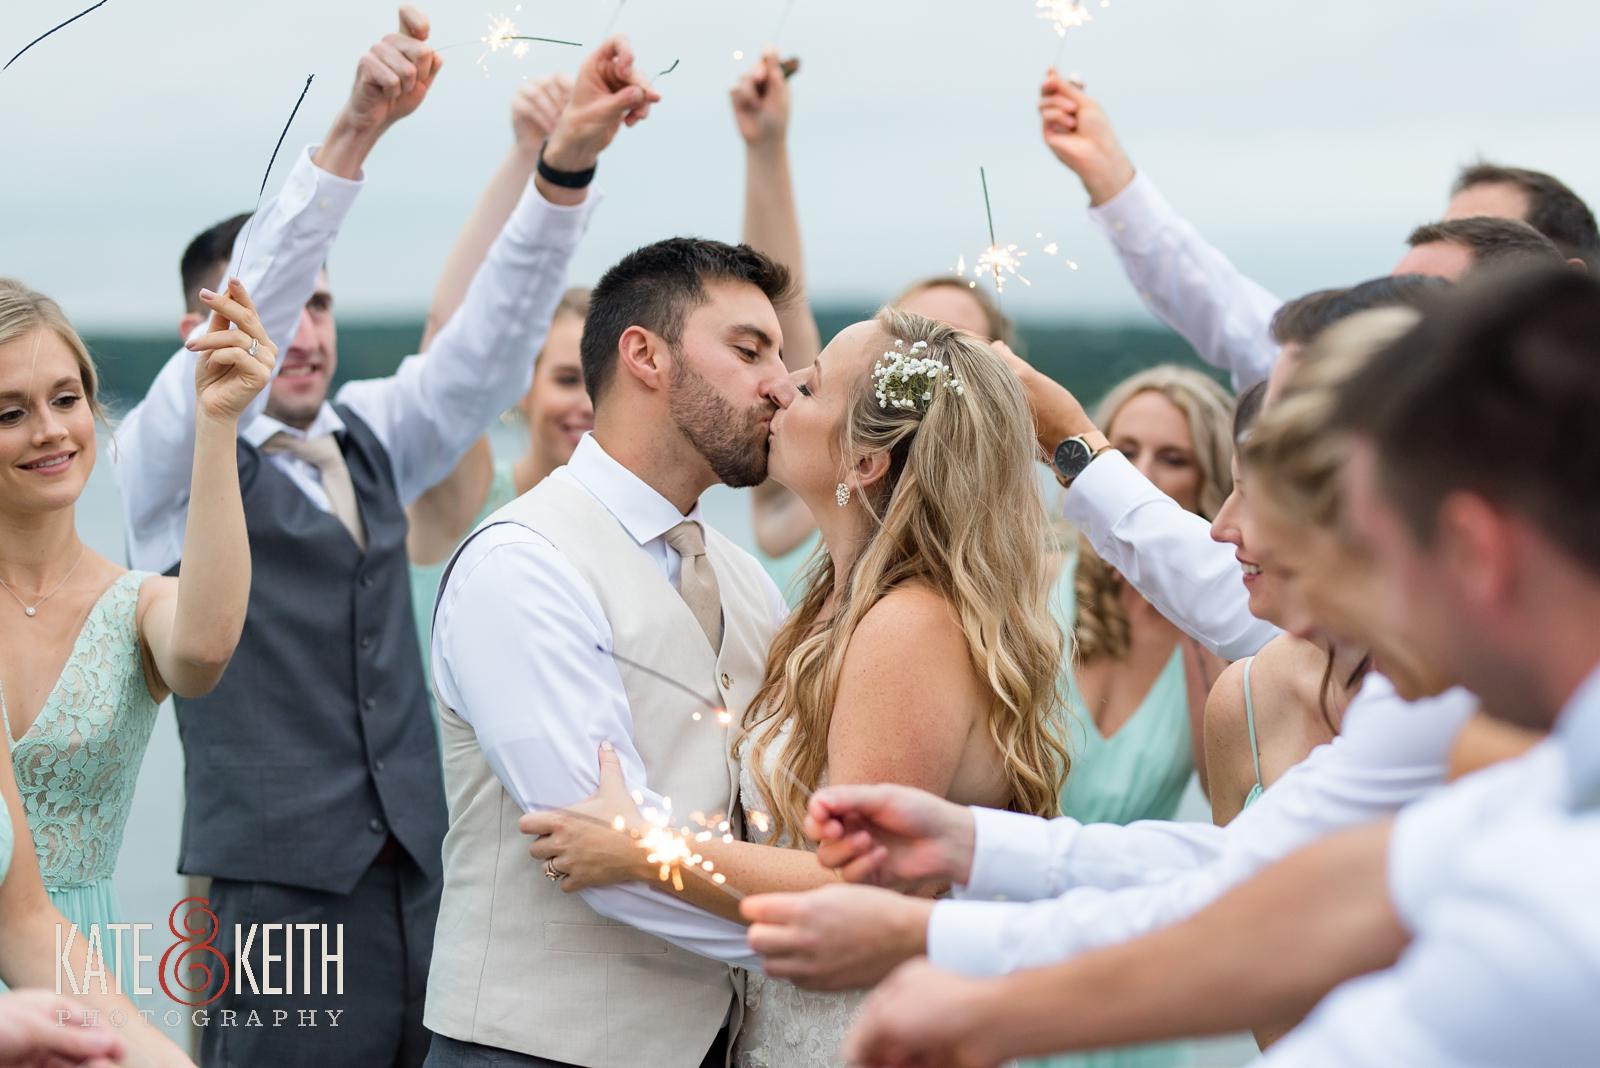 New Hampshire, Lakes Region, Lake Winnipesaukee, The Margate Resort, wedding, outdoor wedding, lakeside wedding,  bridal party, group photo, fun group photo, fun wedding portraits, silly wedding portraits, silly wedding party photos, sparklers, wedding sparklers, sparkler kiss